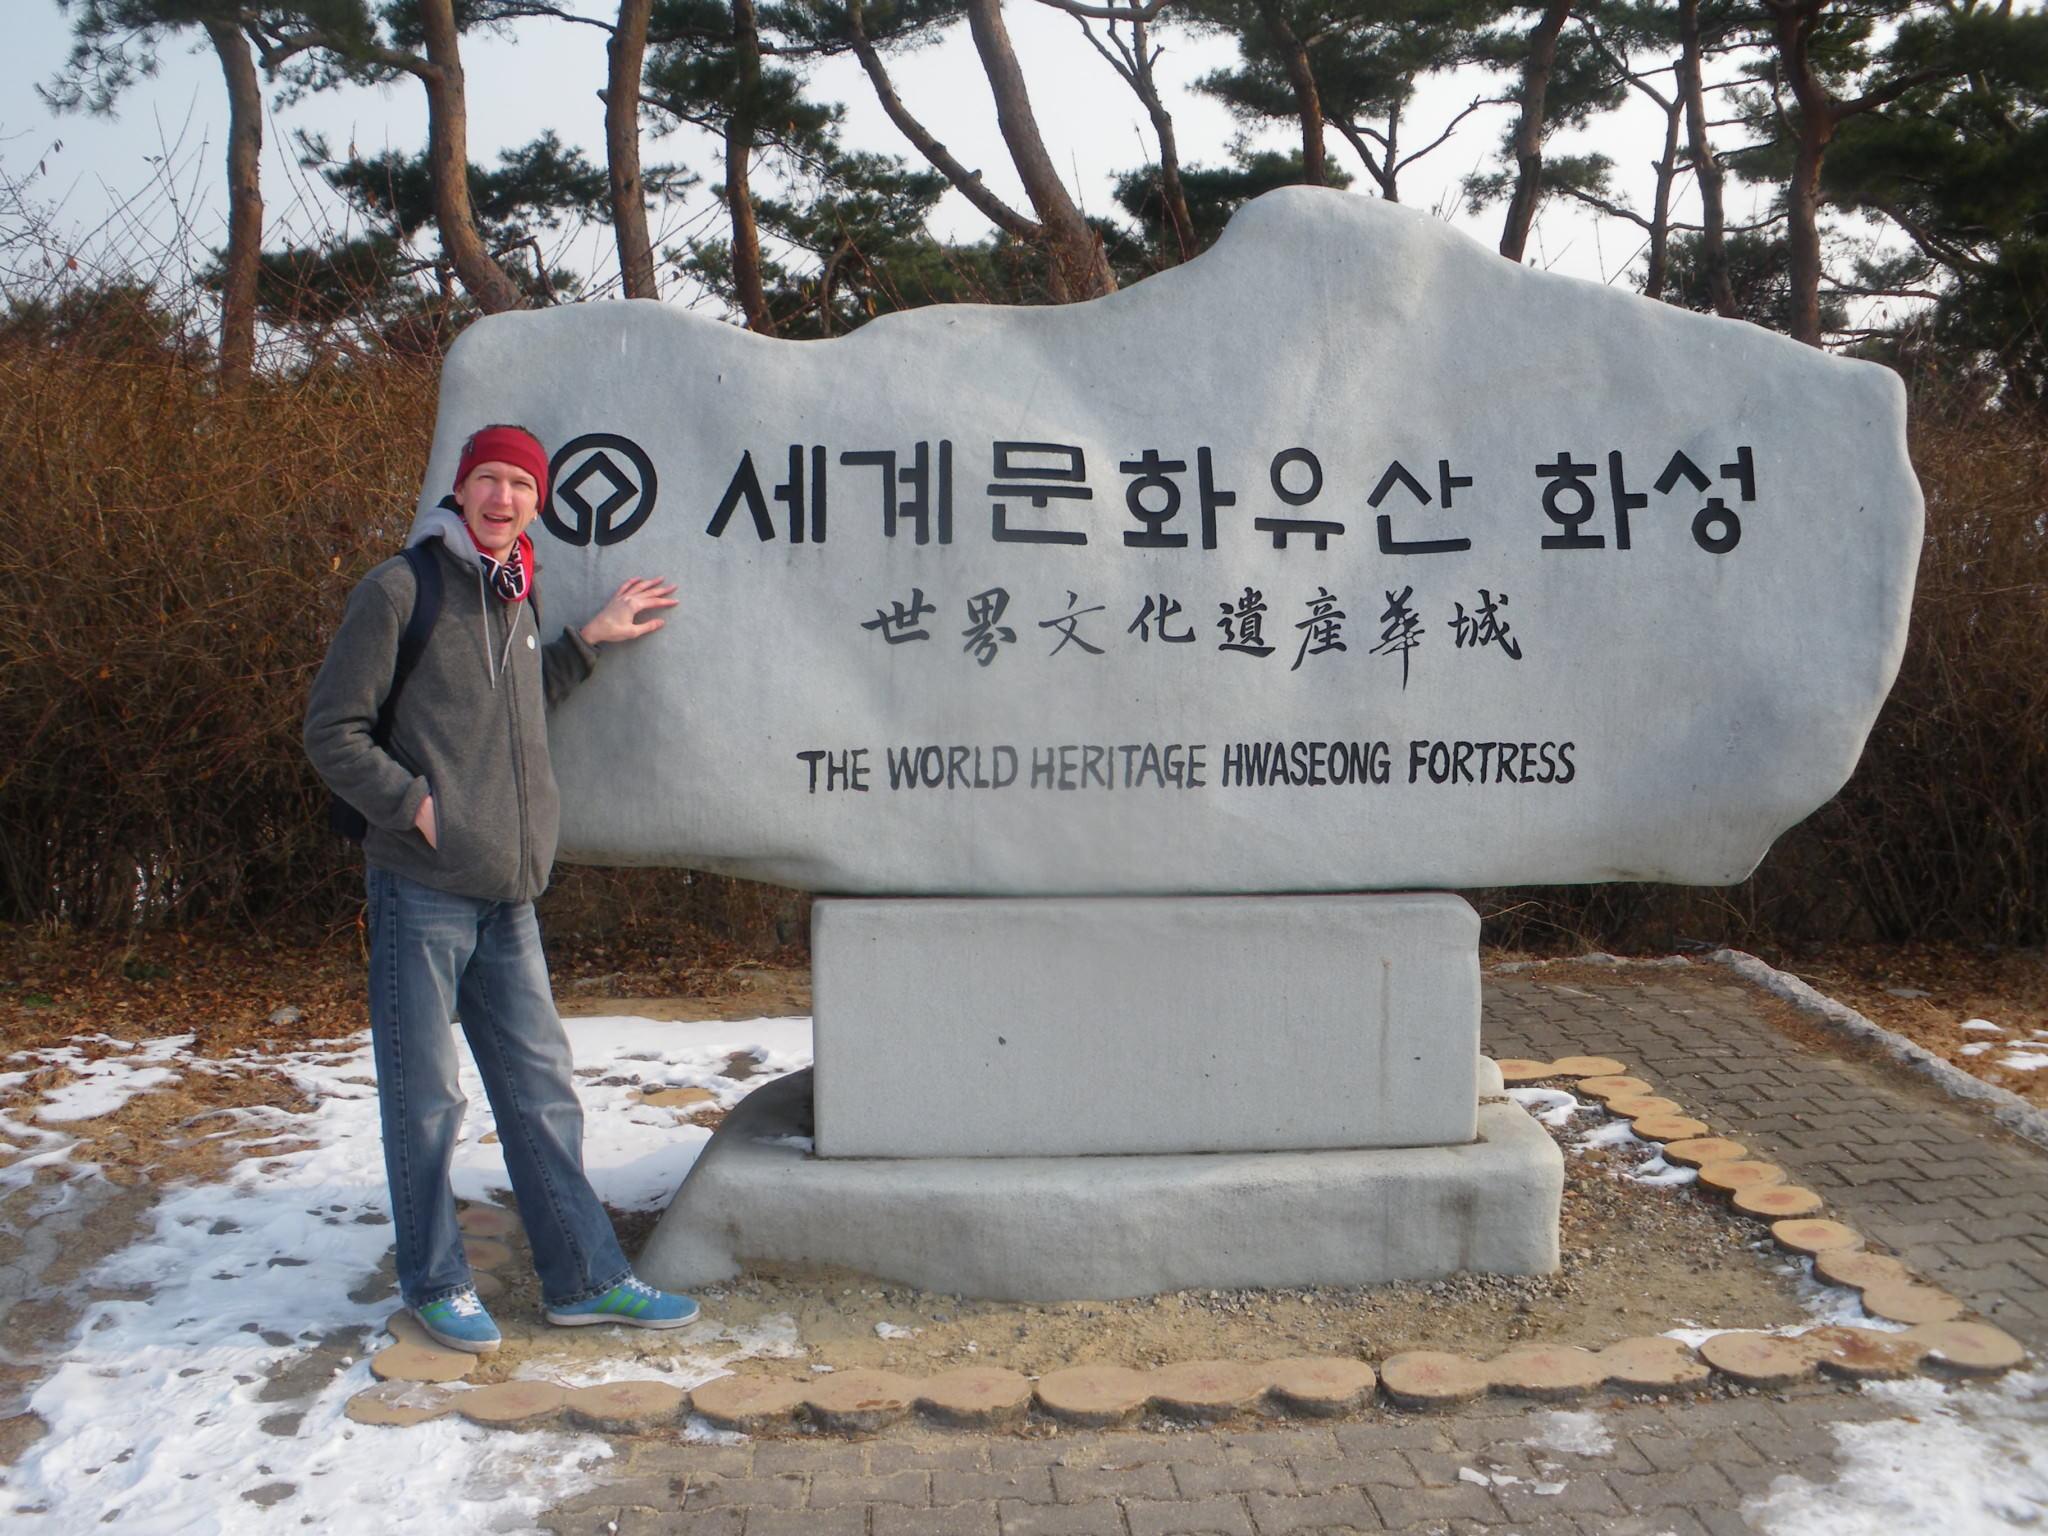 Jonny Blair visited Hwaseong Fortress in Suwon, South Korea